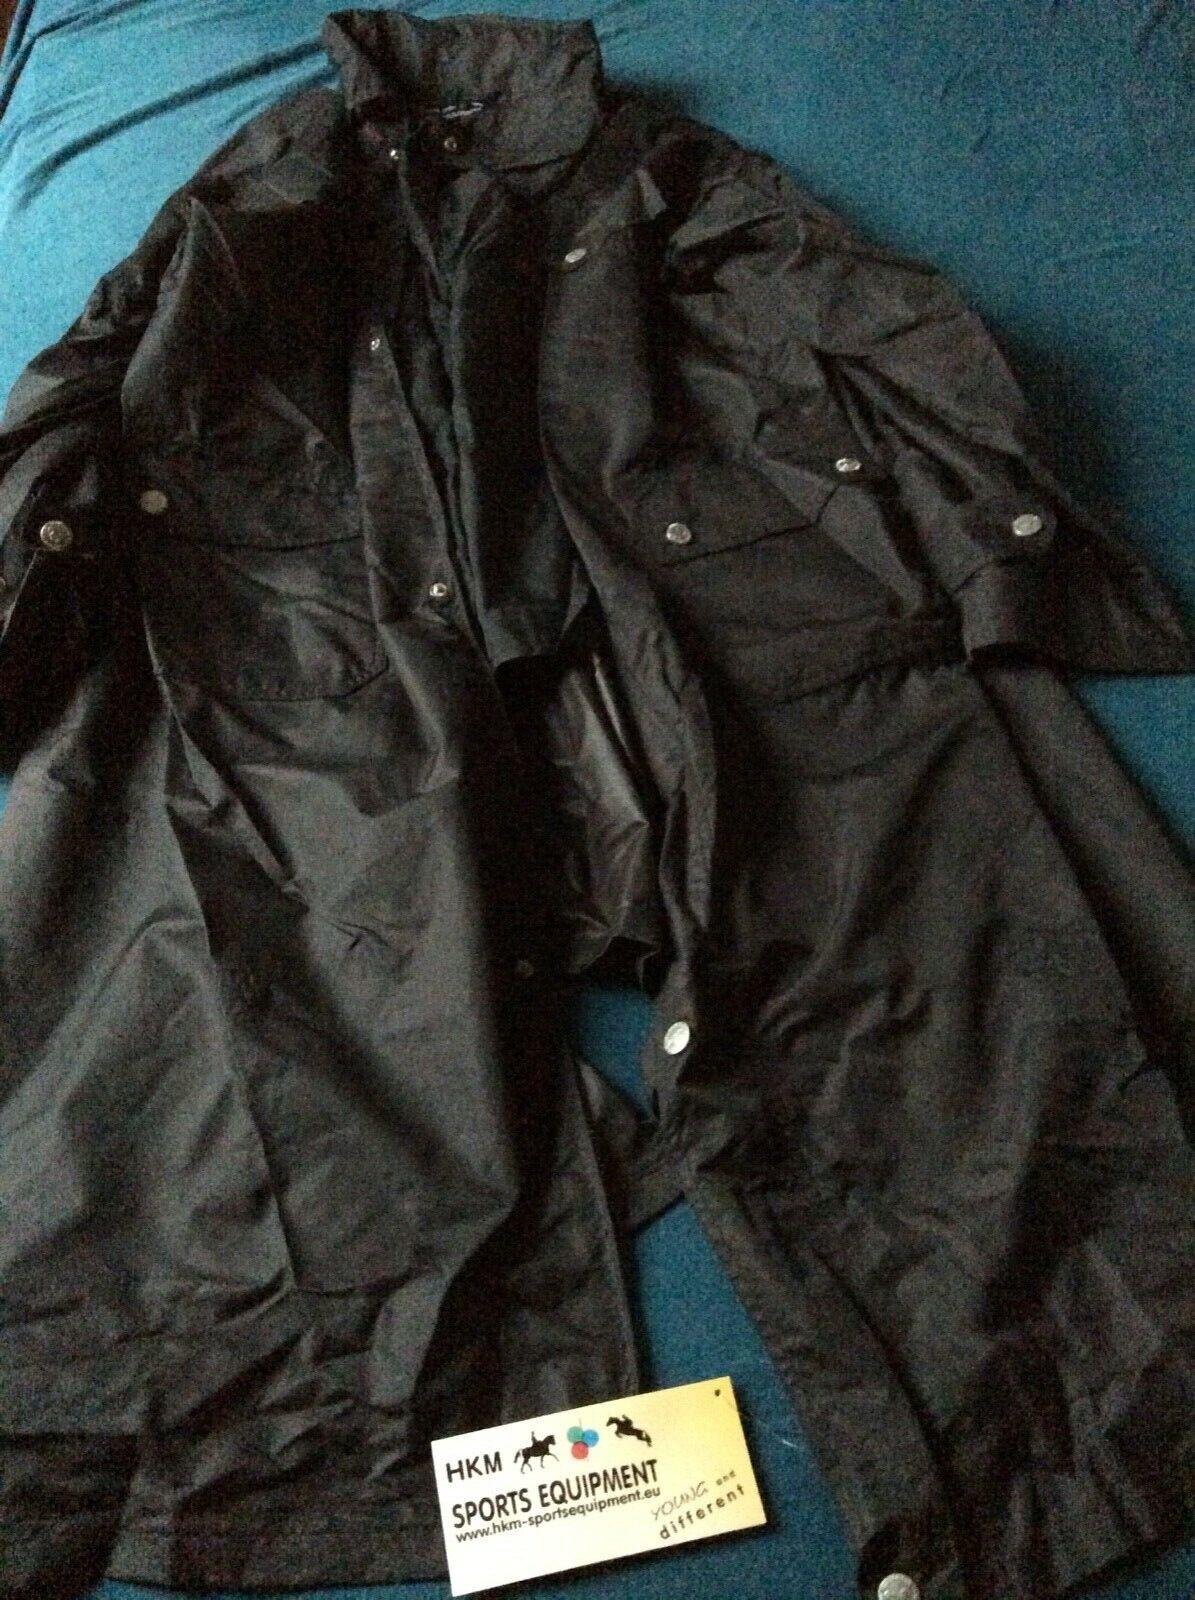 Outdoor Reit Regen Mantel, HKM, schwarz, faltbare Kapuze, Gr. XL, Unisex - NEU